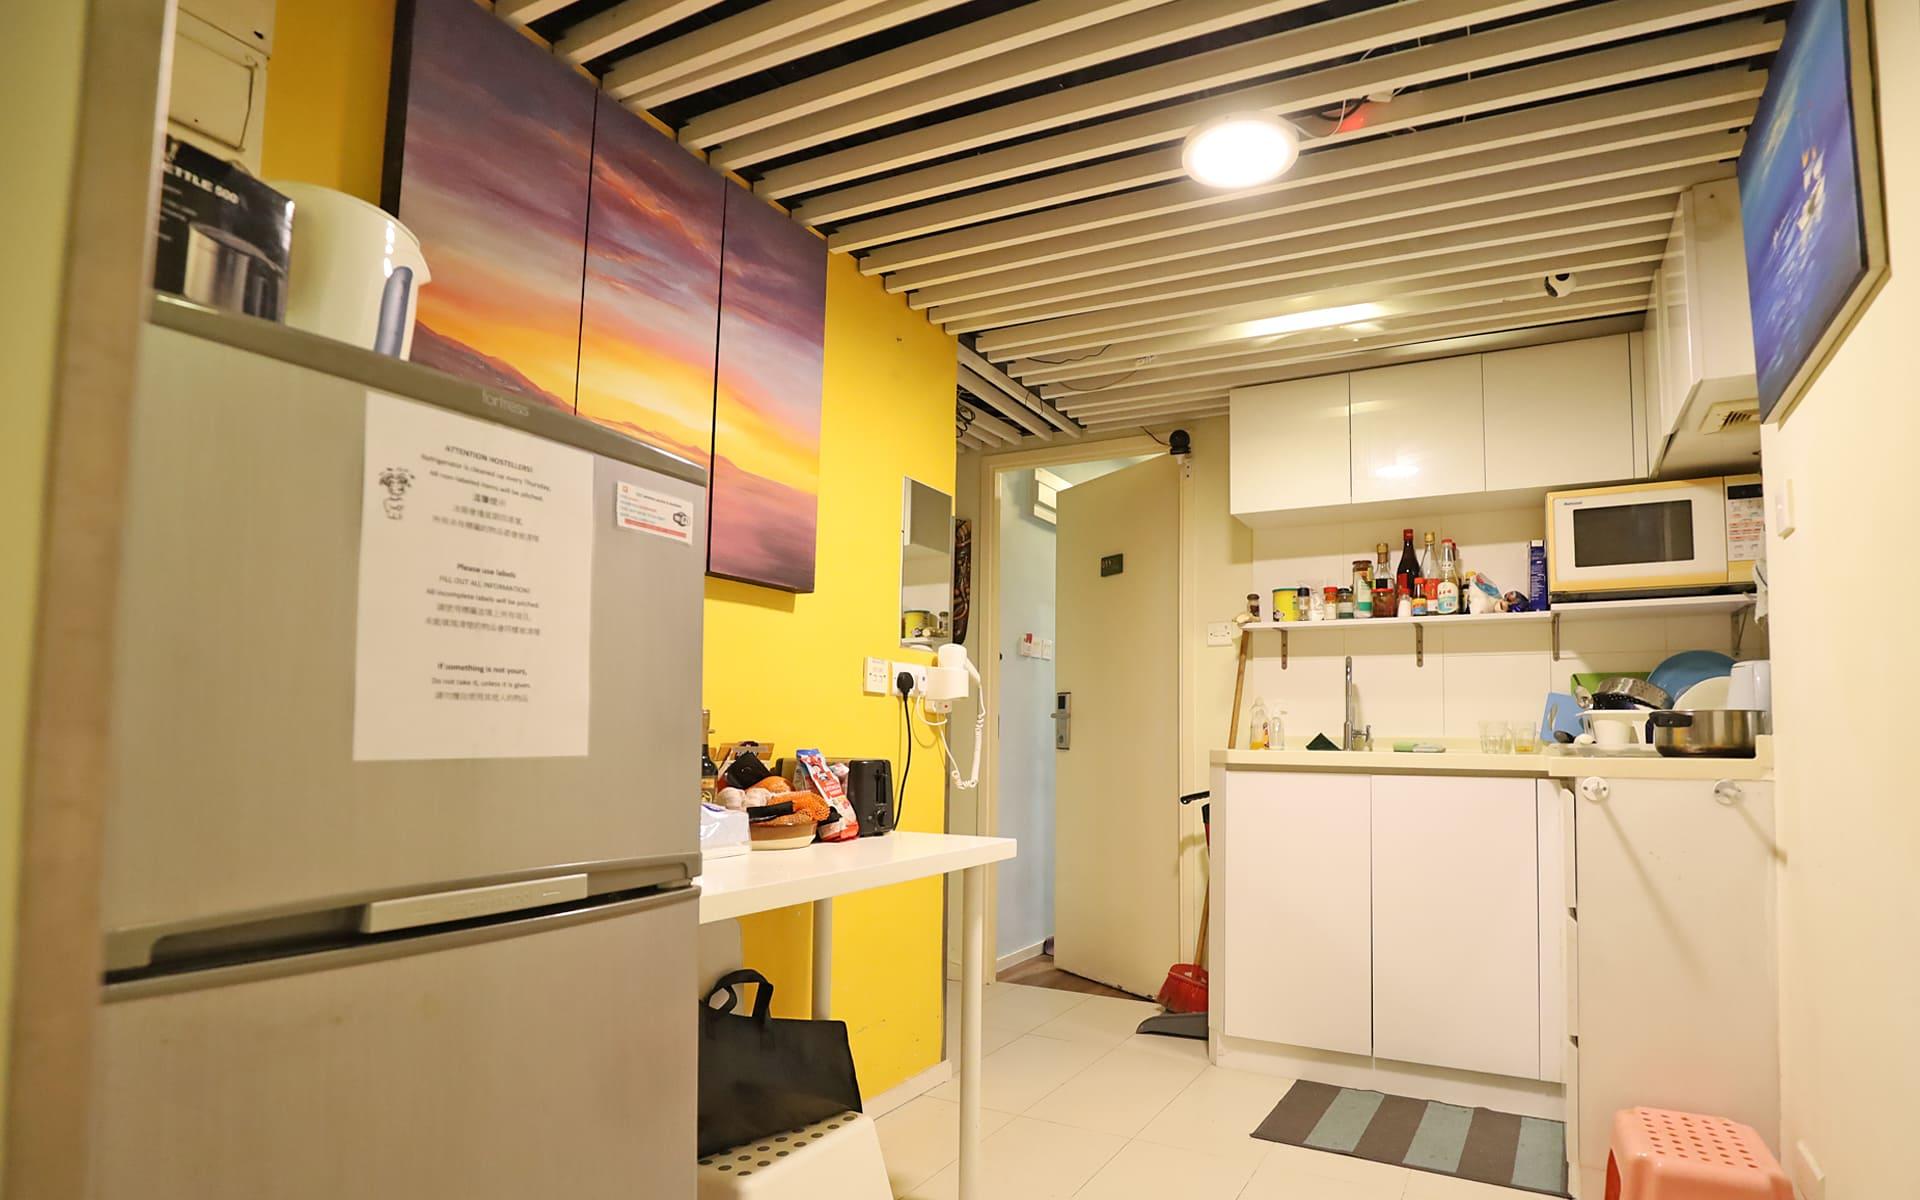 hk_service_apartment_20146907631596886785.jpg